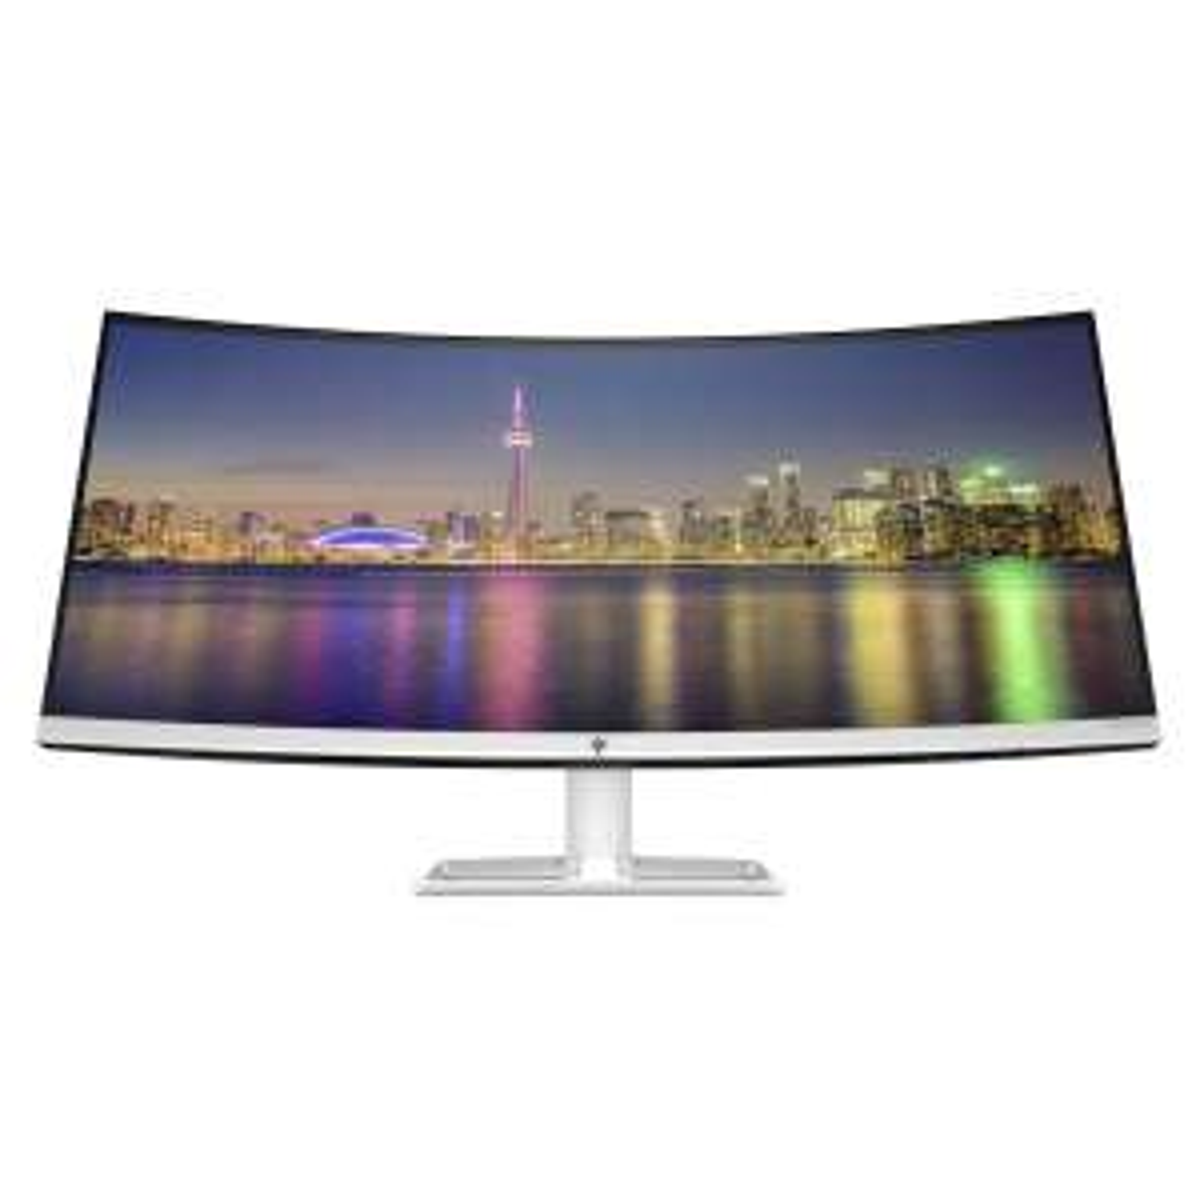 HP 34f Curved Display- 86 cm (34 Zoll), LED, Curved IPS-Panel, UWQHD, AMD FreeSync, USB-Hub, 75Hz [NBB]